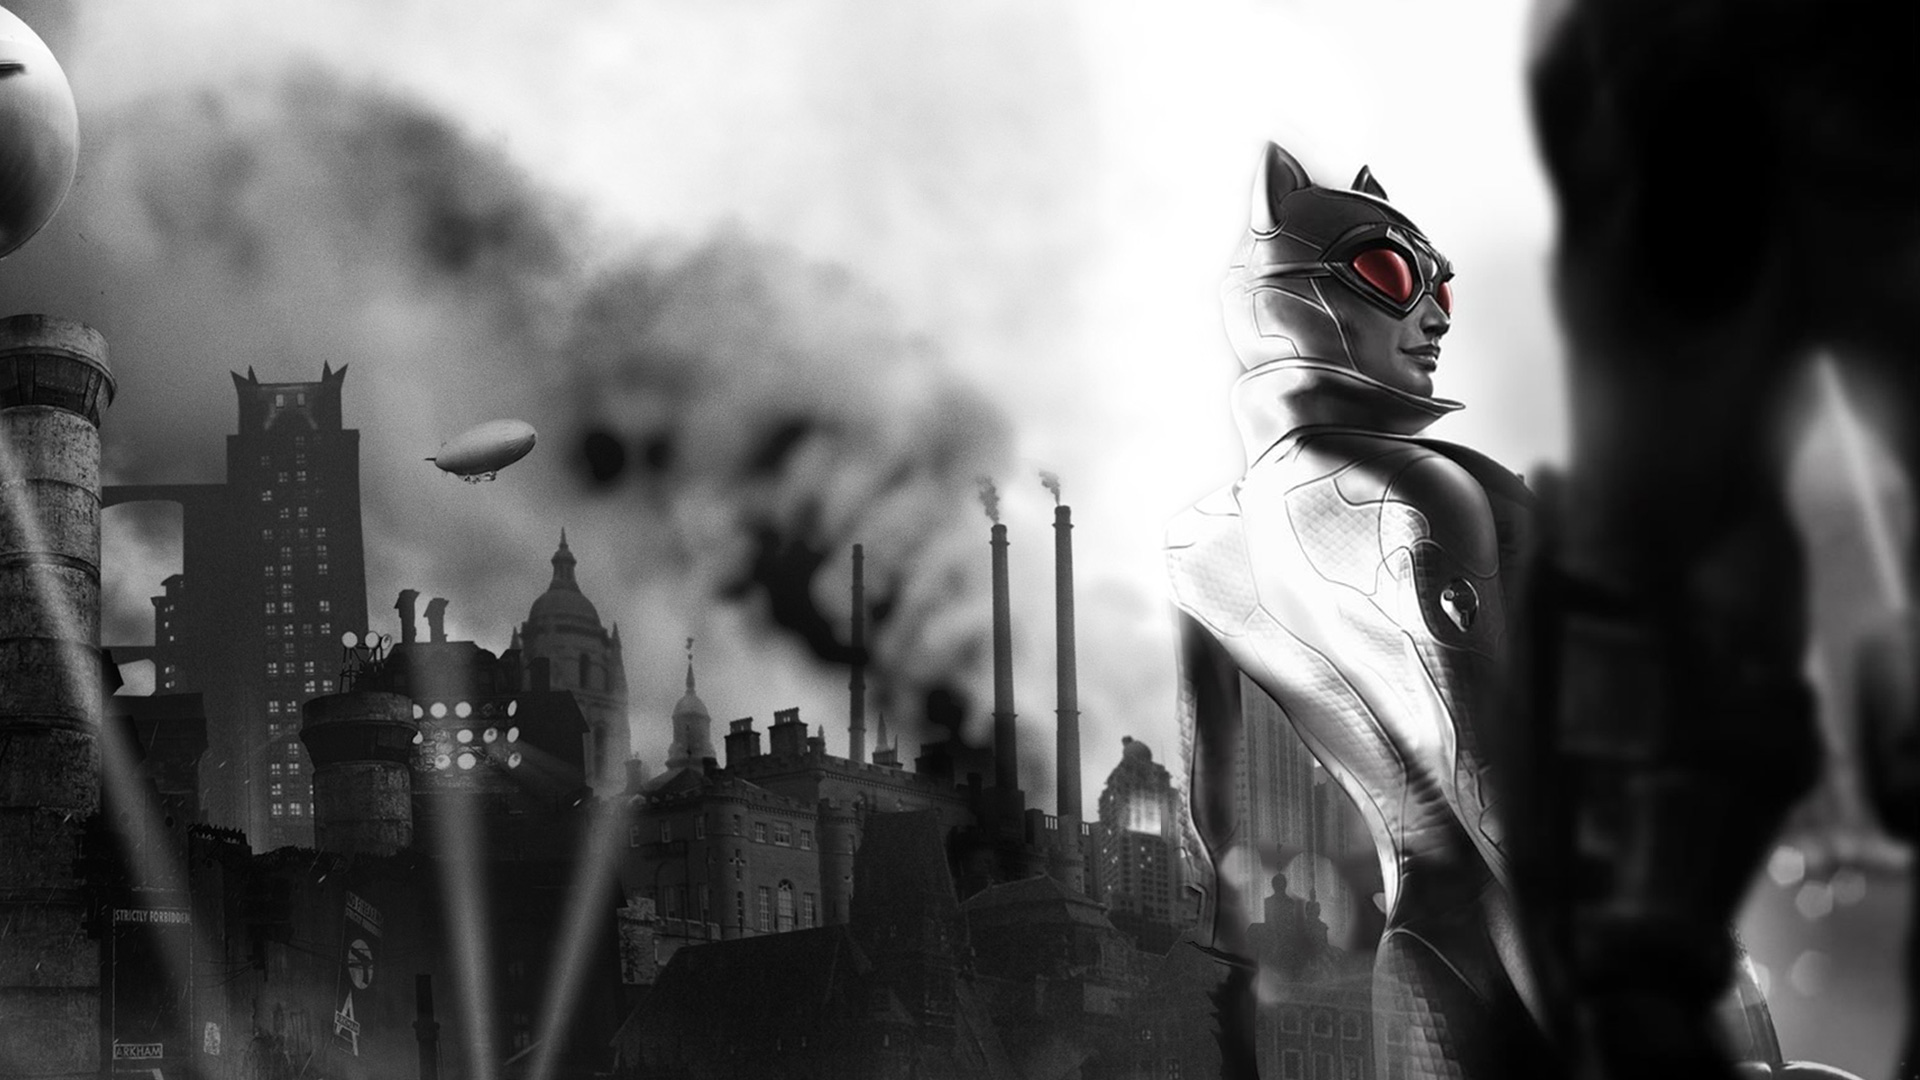 Batman: Arkham City Wallpaper in 1920x1080